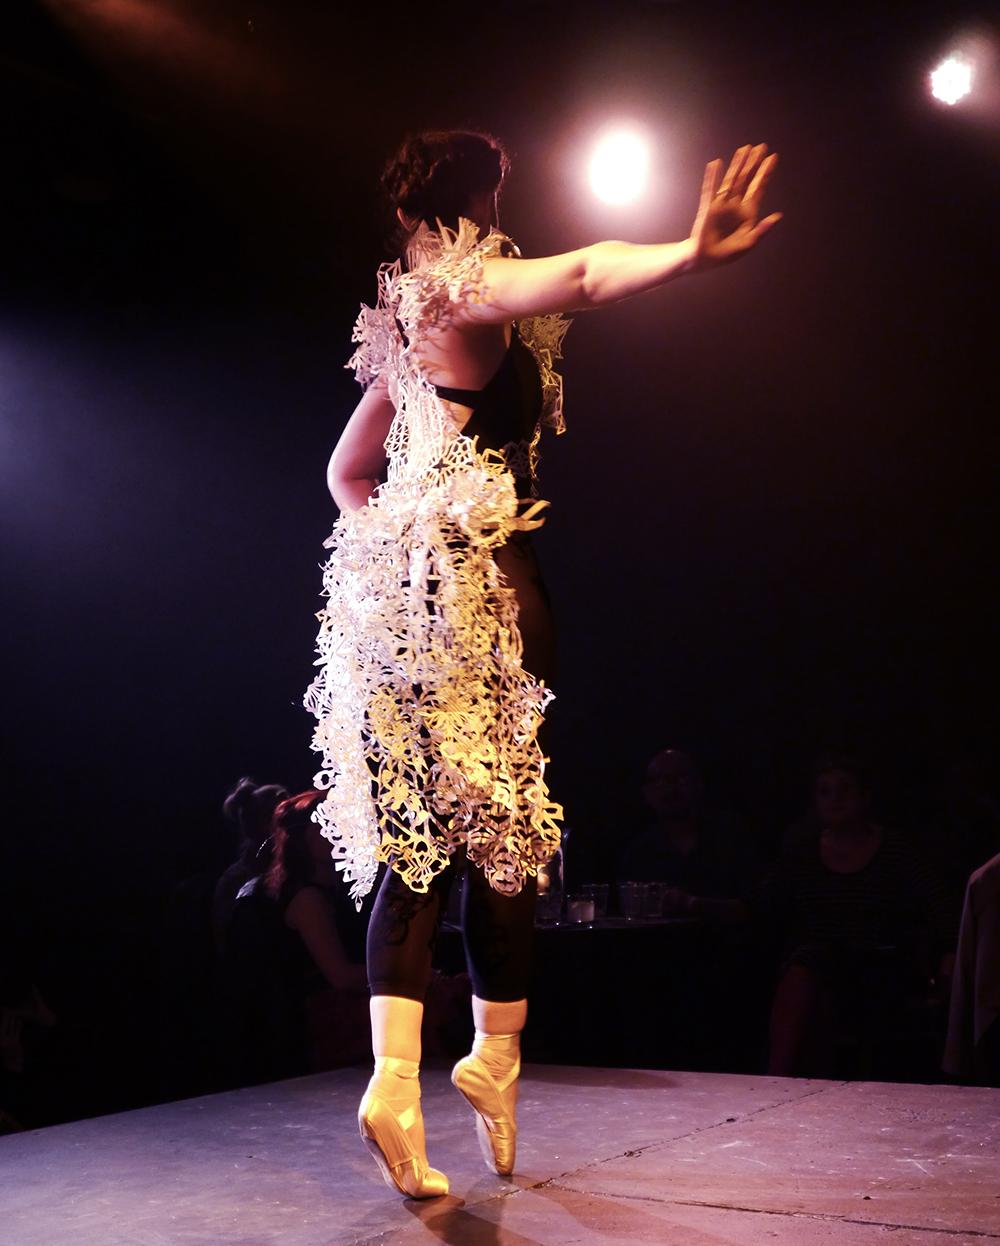 Dundee Wearable Art, Dundee Wearable Art Show, Wearable art, performance, fashion and art, Scottish Bloggers,  Rachel Goodwin - Ice Crystal, paper cut, paper cut dress, ballet